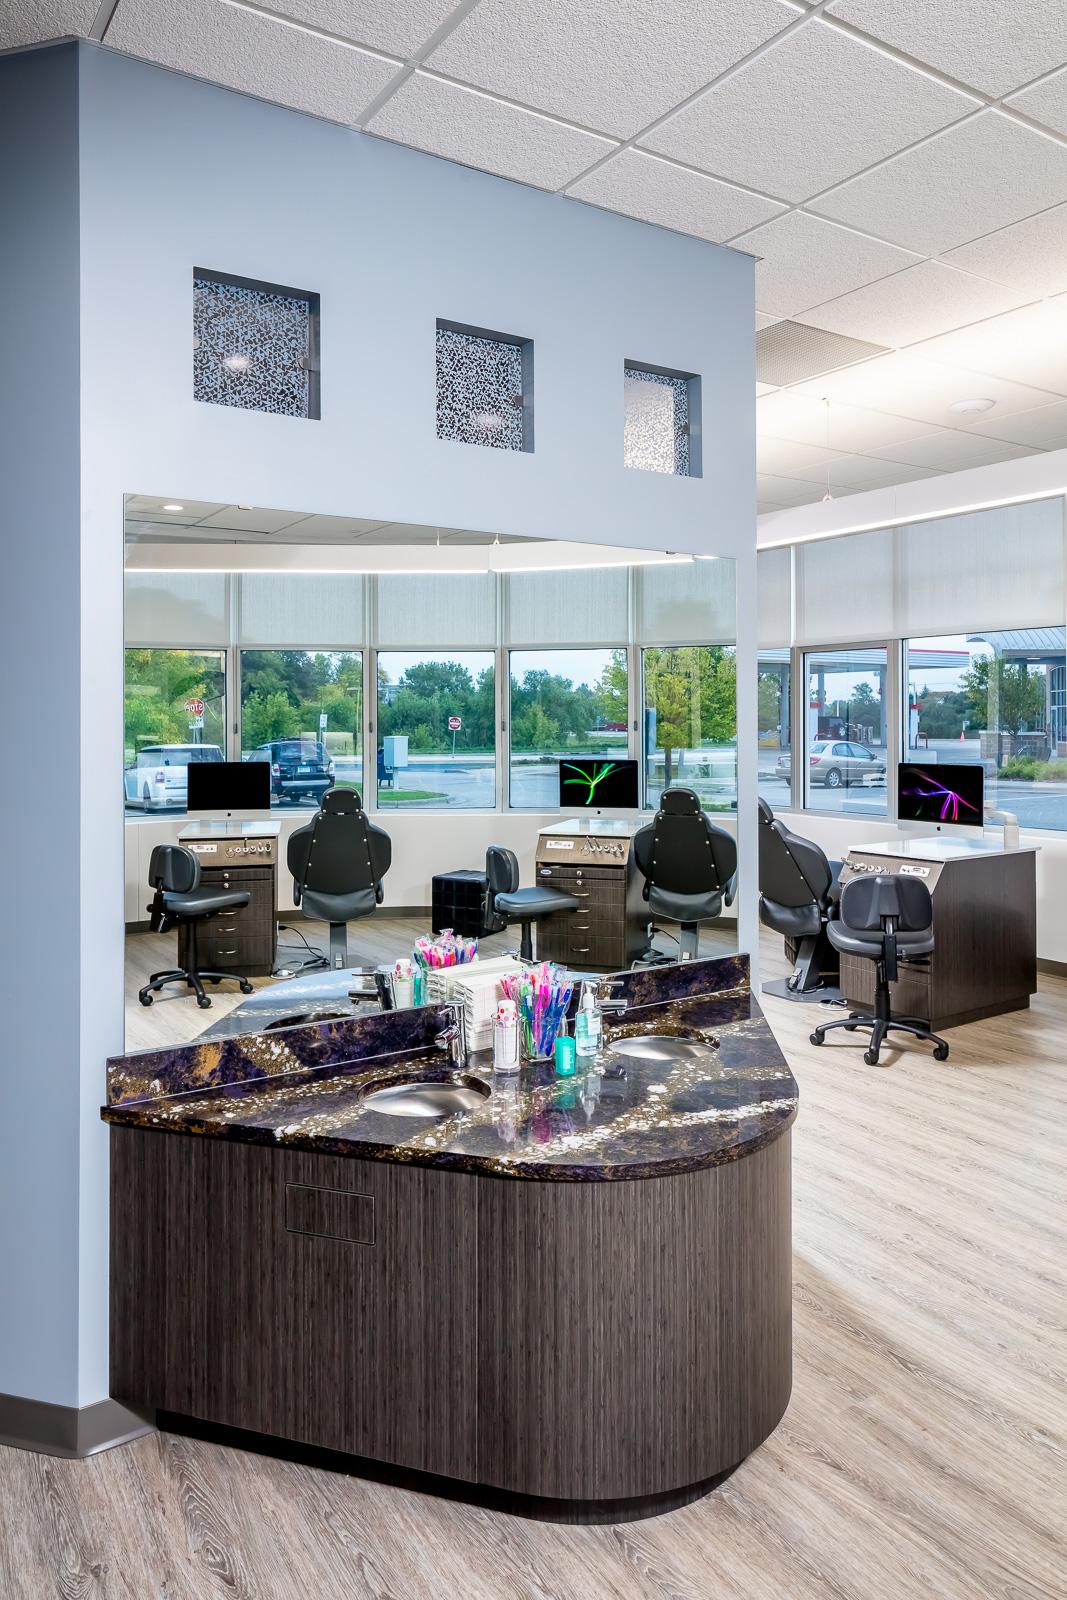 Michael King Orthodontics - Toothbrush Station